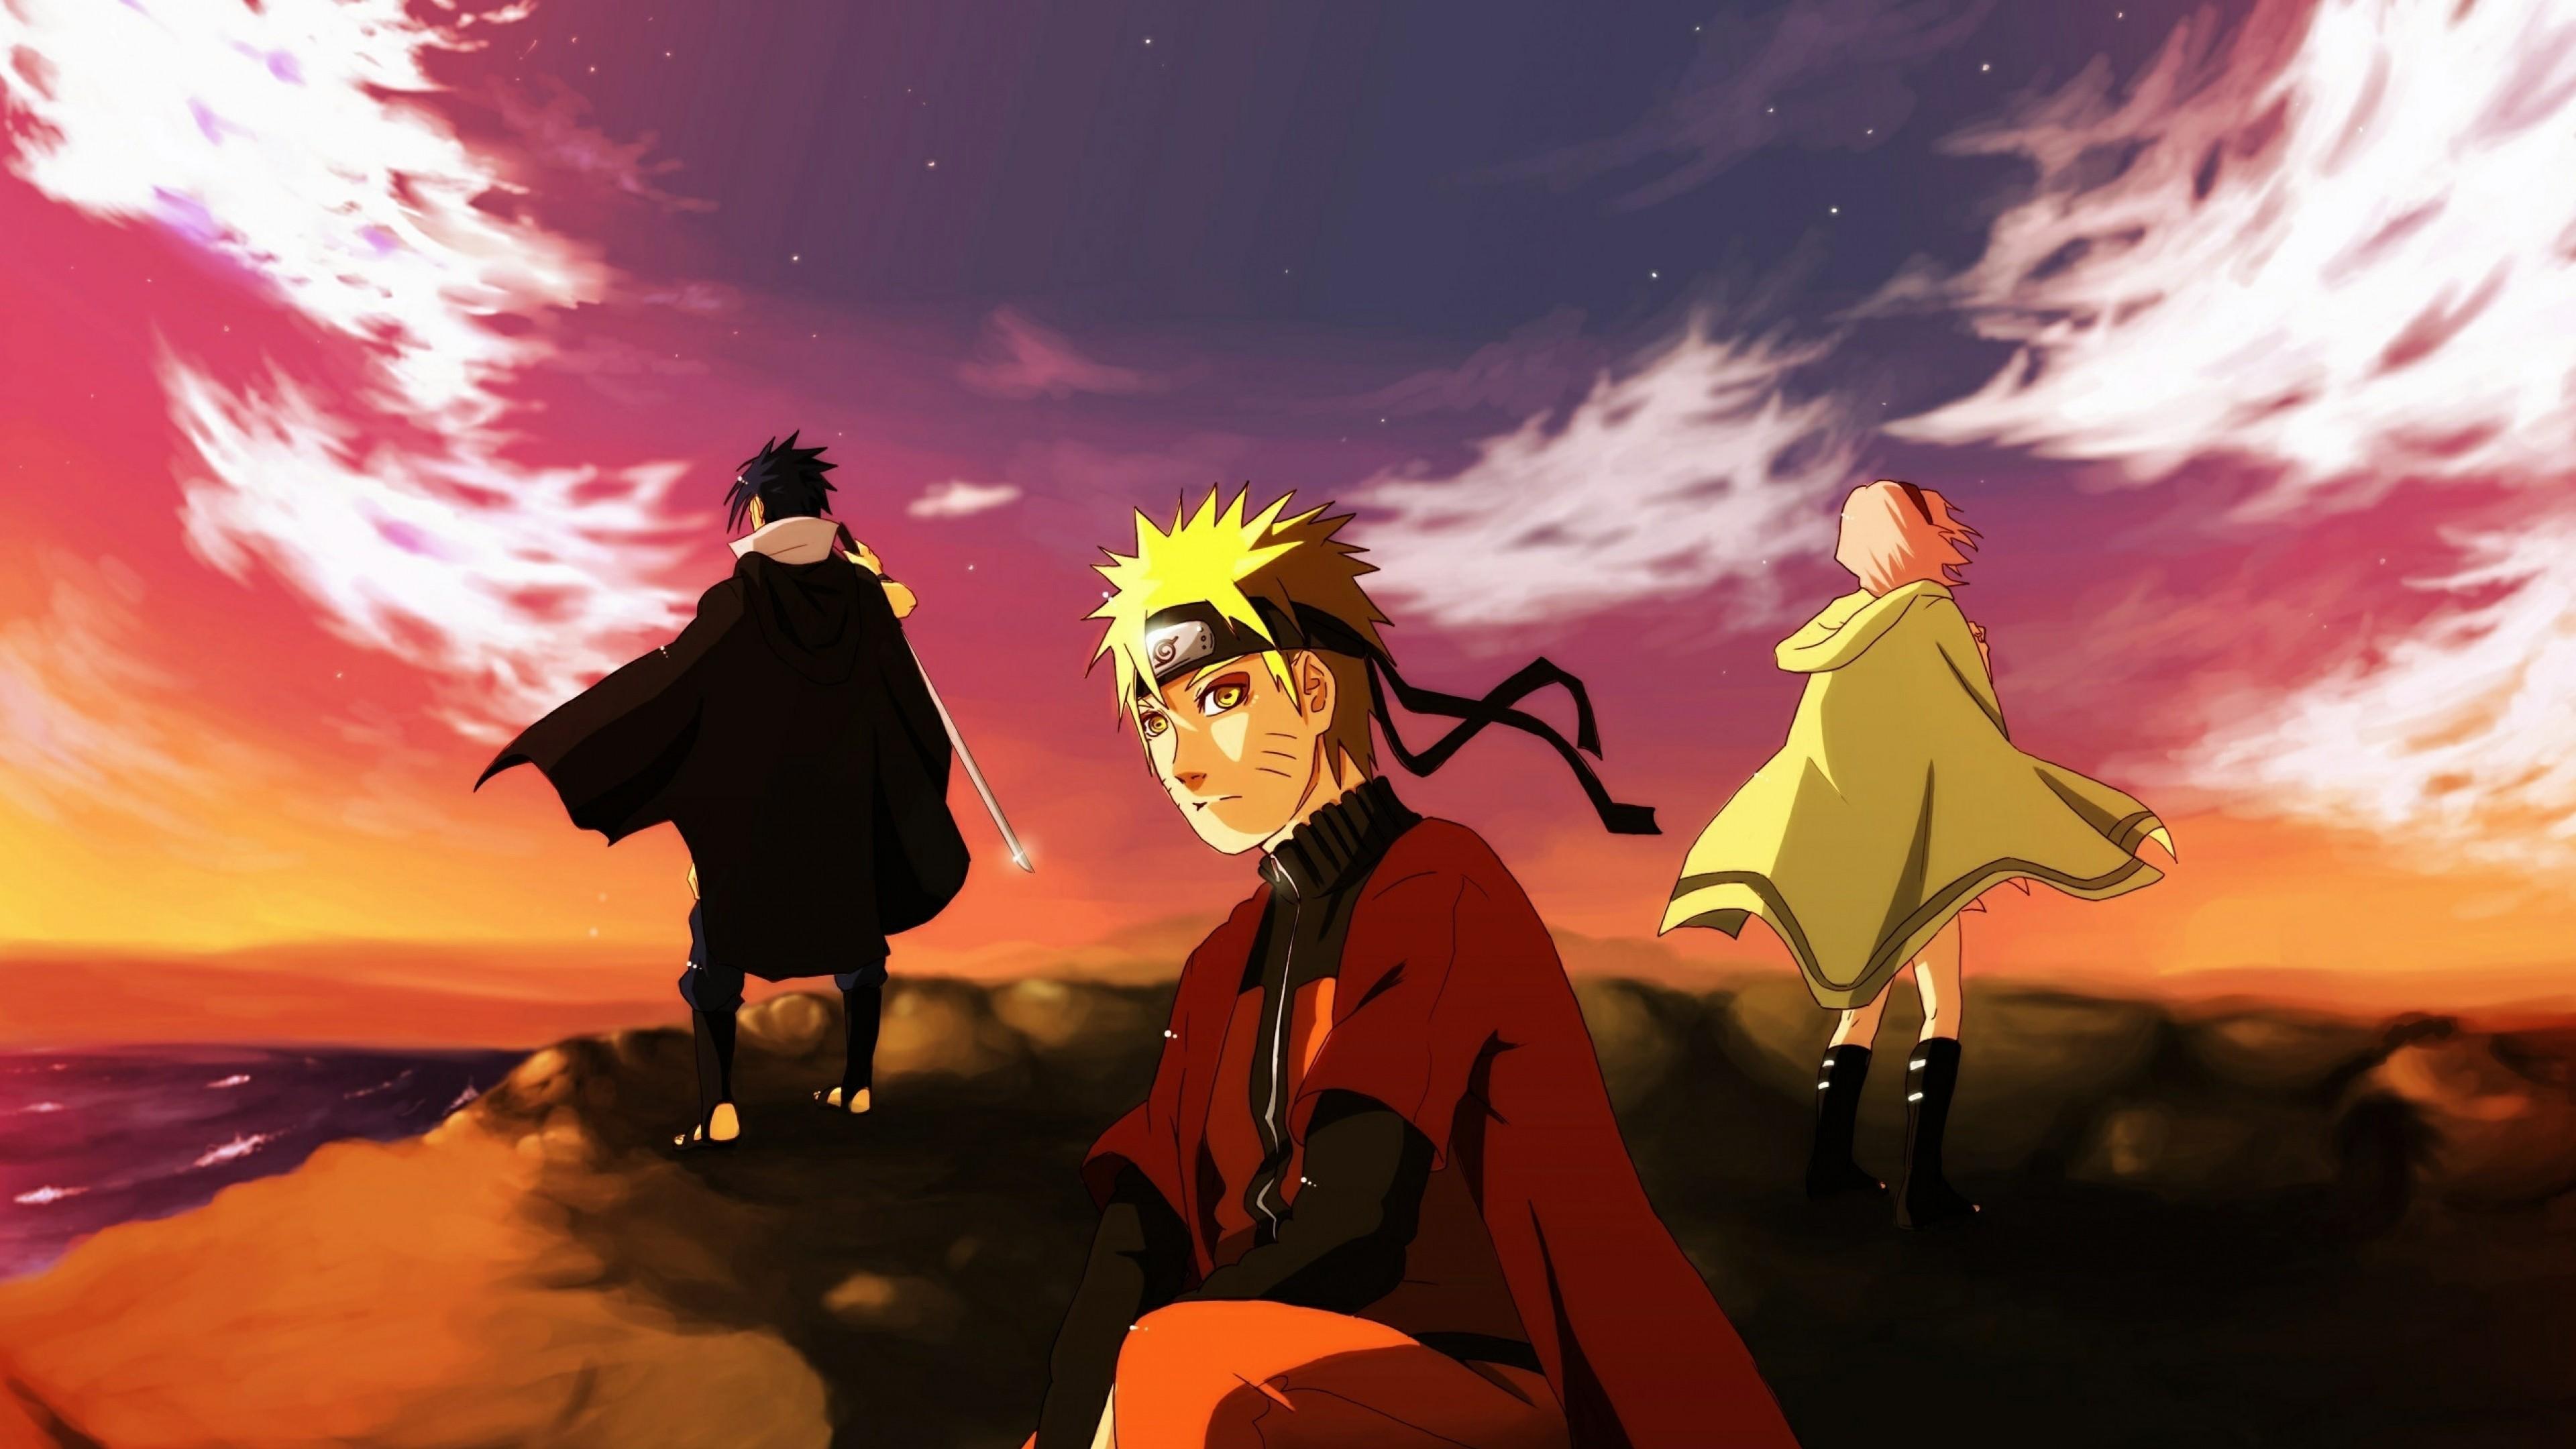 Naruto Sasuke Sakura Wallpaper 56 Images